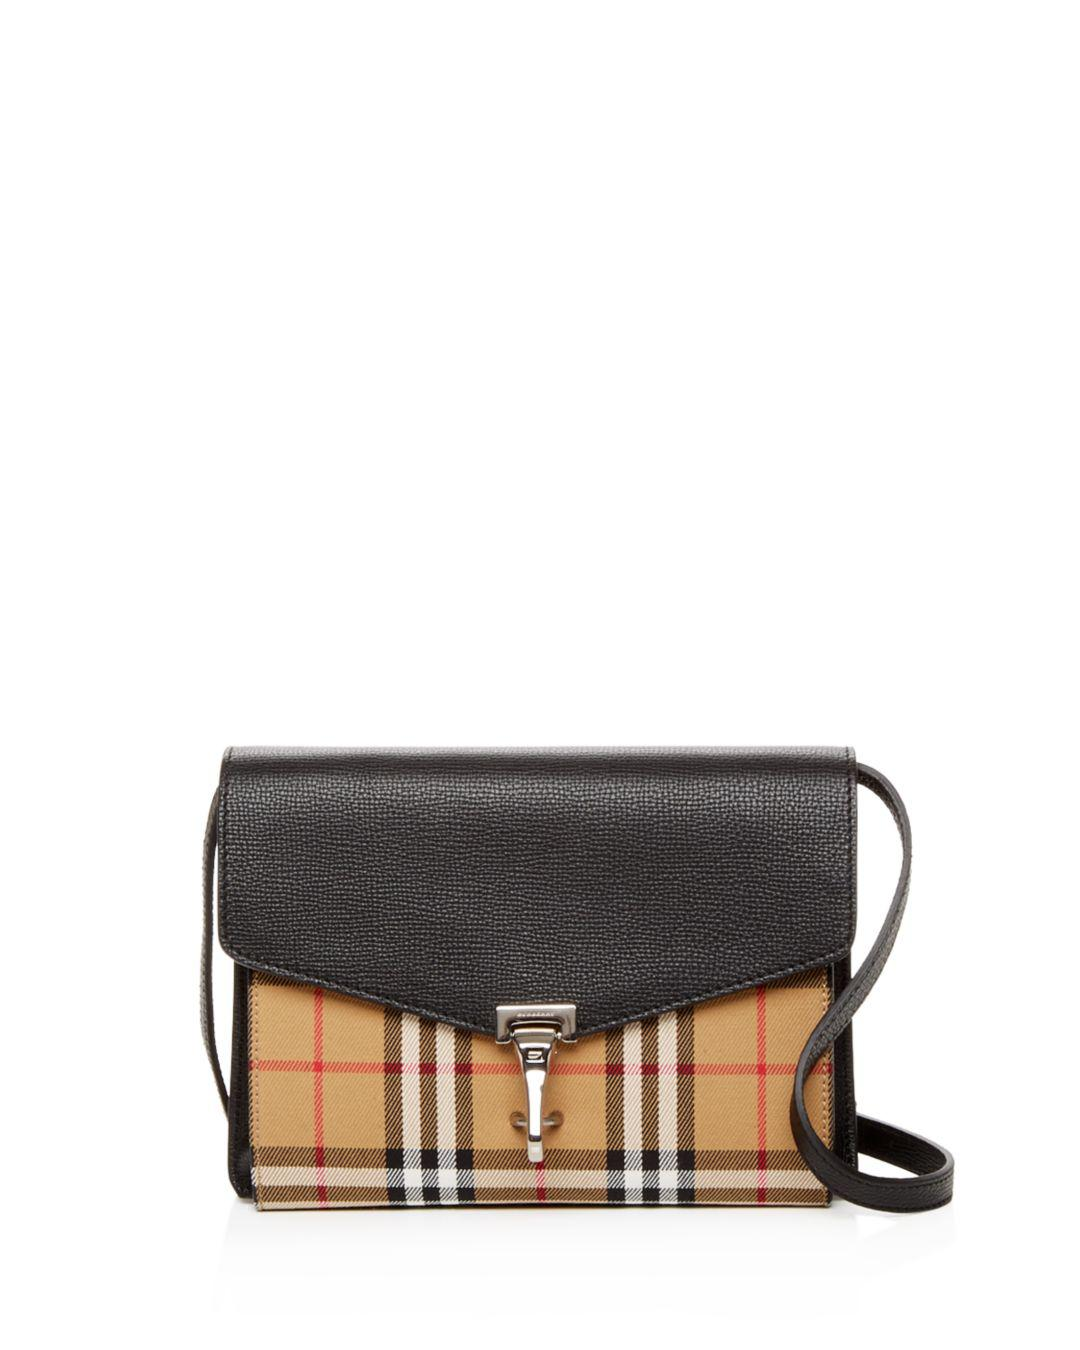 Lyst - Burberry Macken Vintage Check   Leather Shoulder Bag in Black e212d93fcdc0c